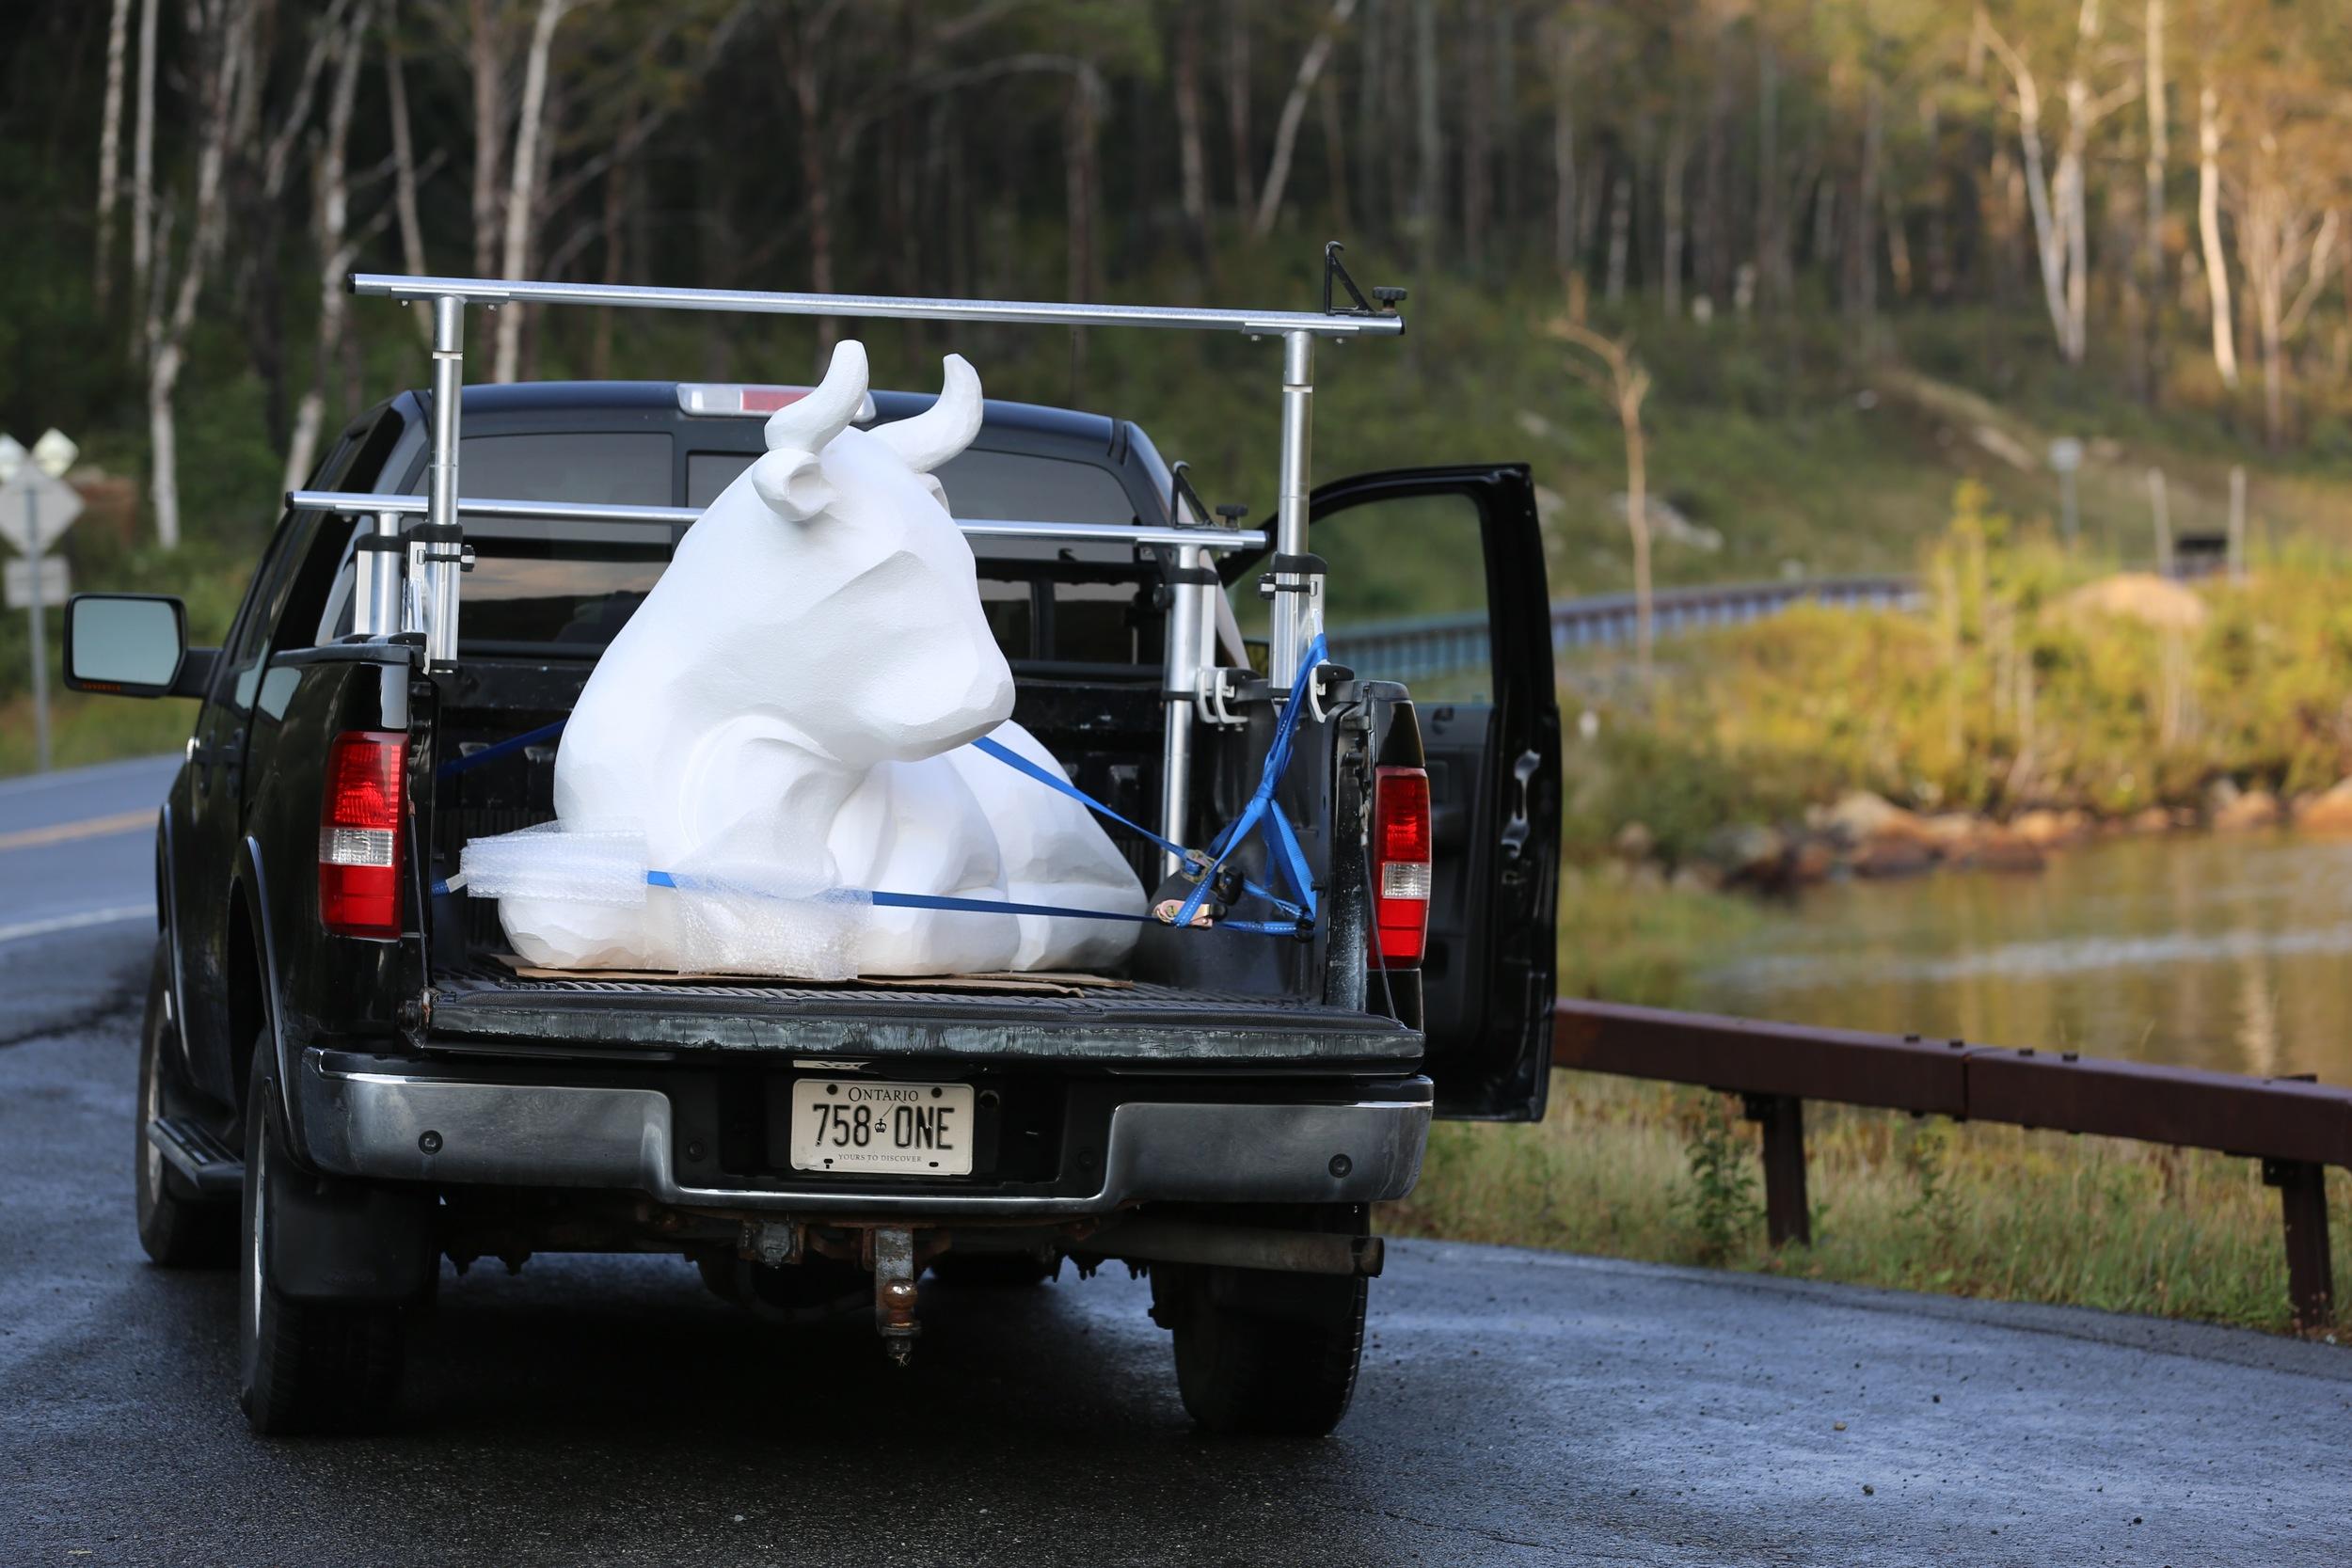 bull in truck.jpg